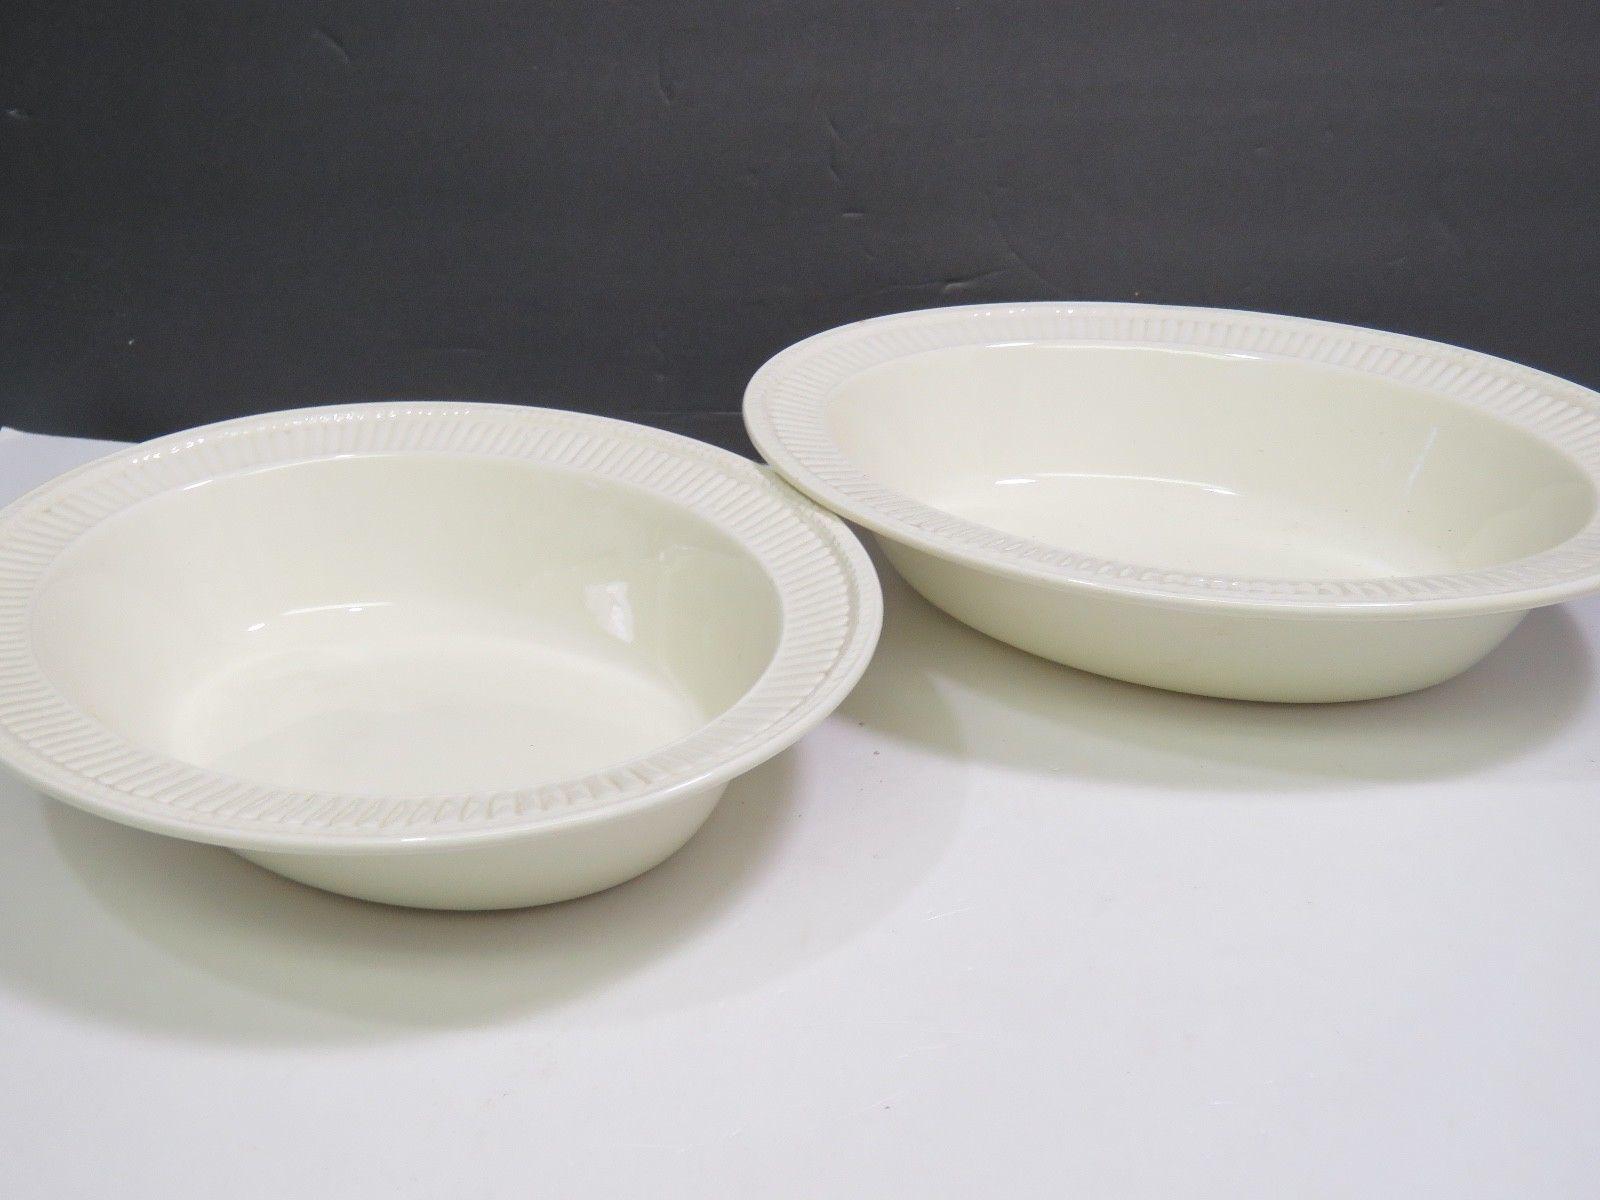 "2 Wedgwood Edme Creamware Oval Vegetable Serving Bowls 10.75"""